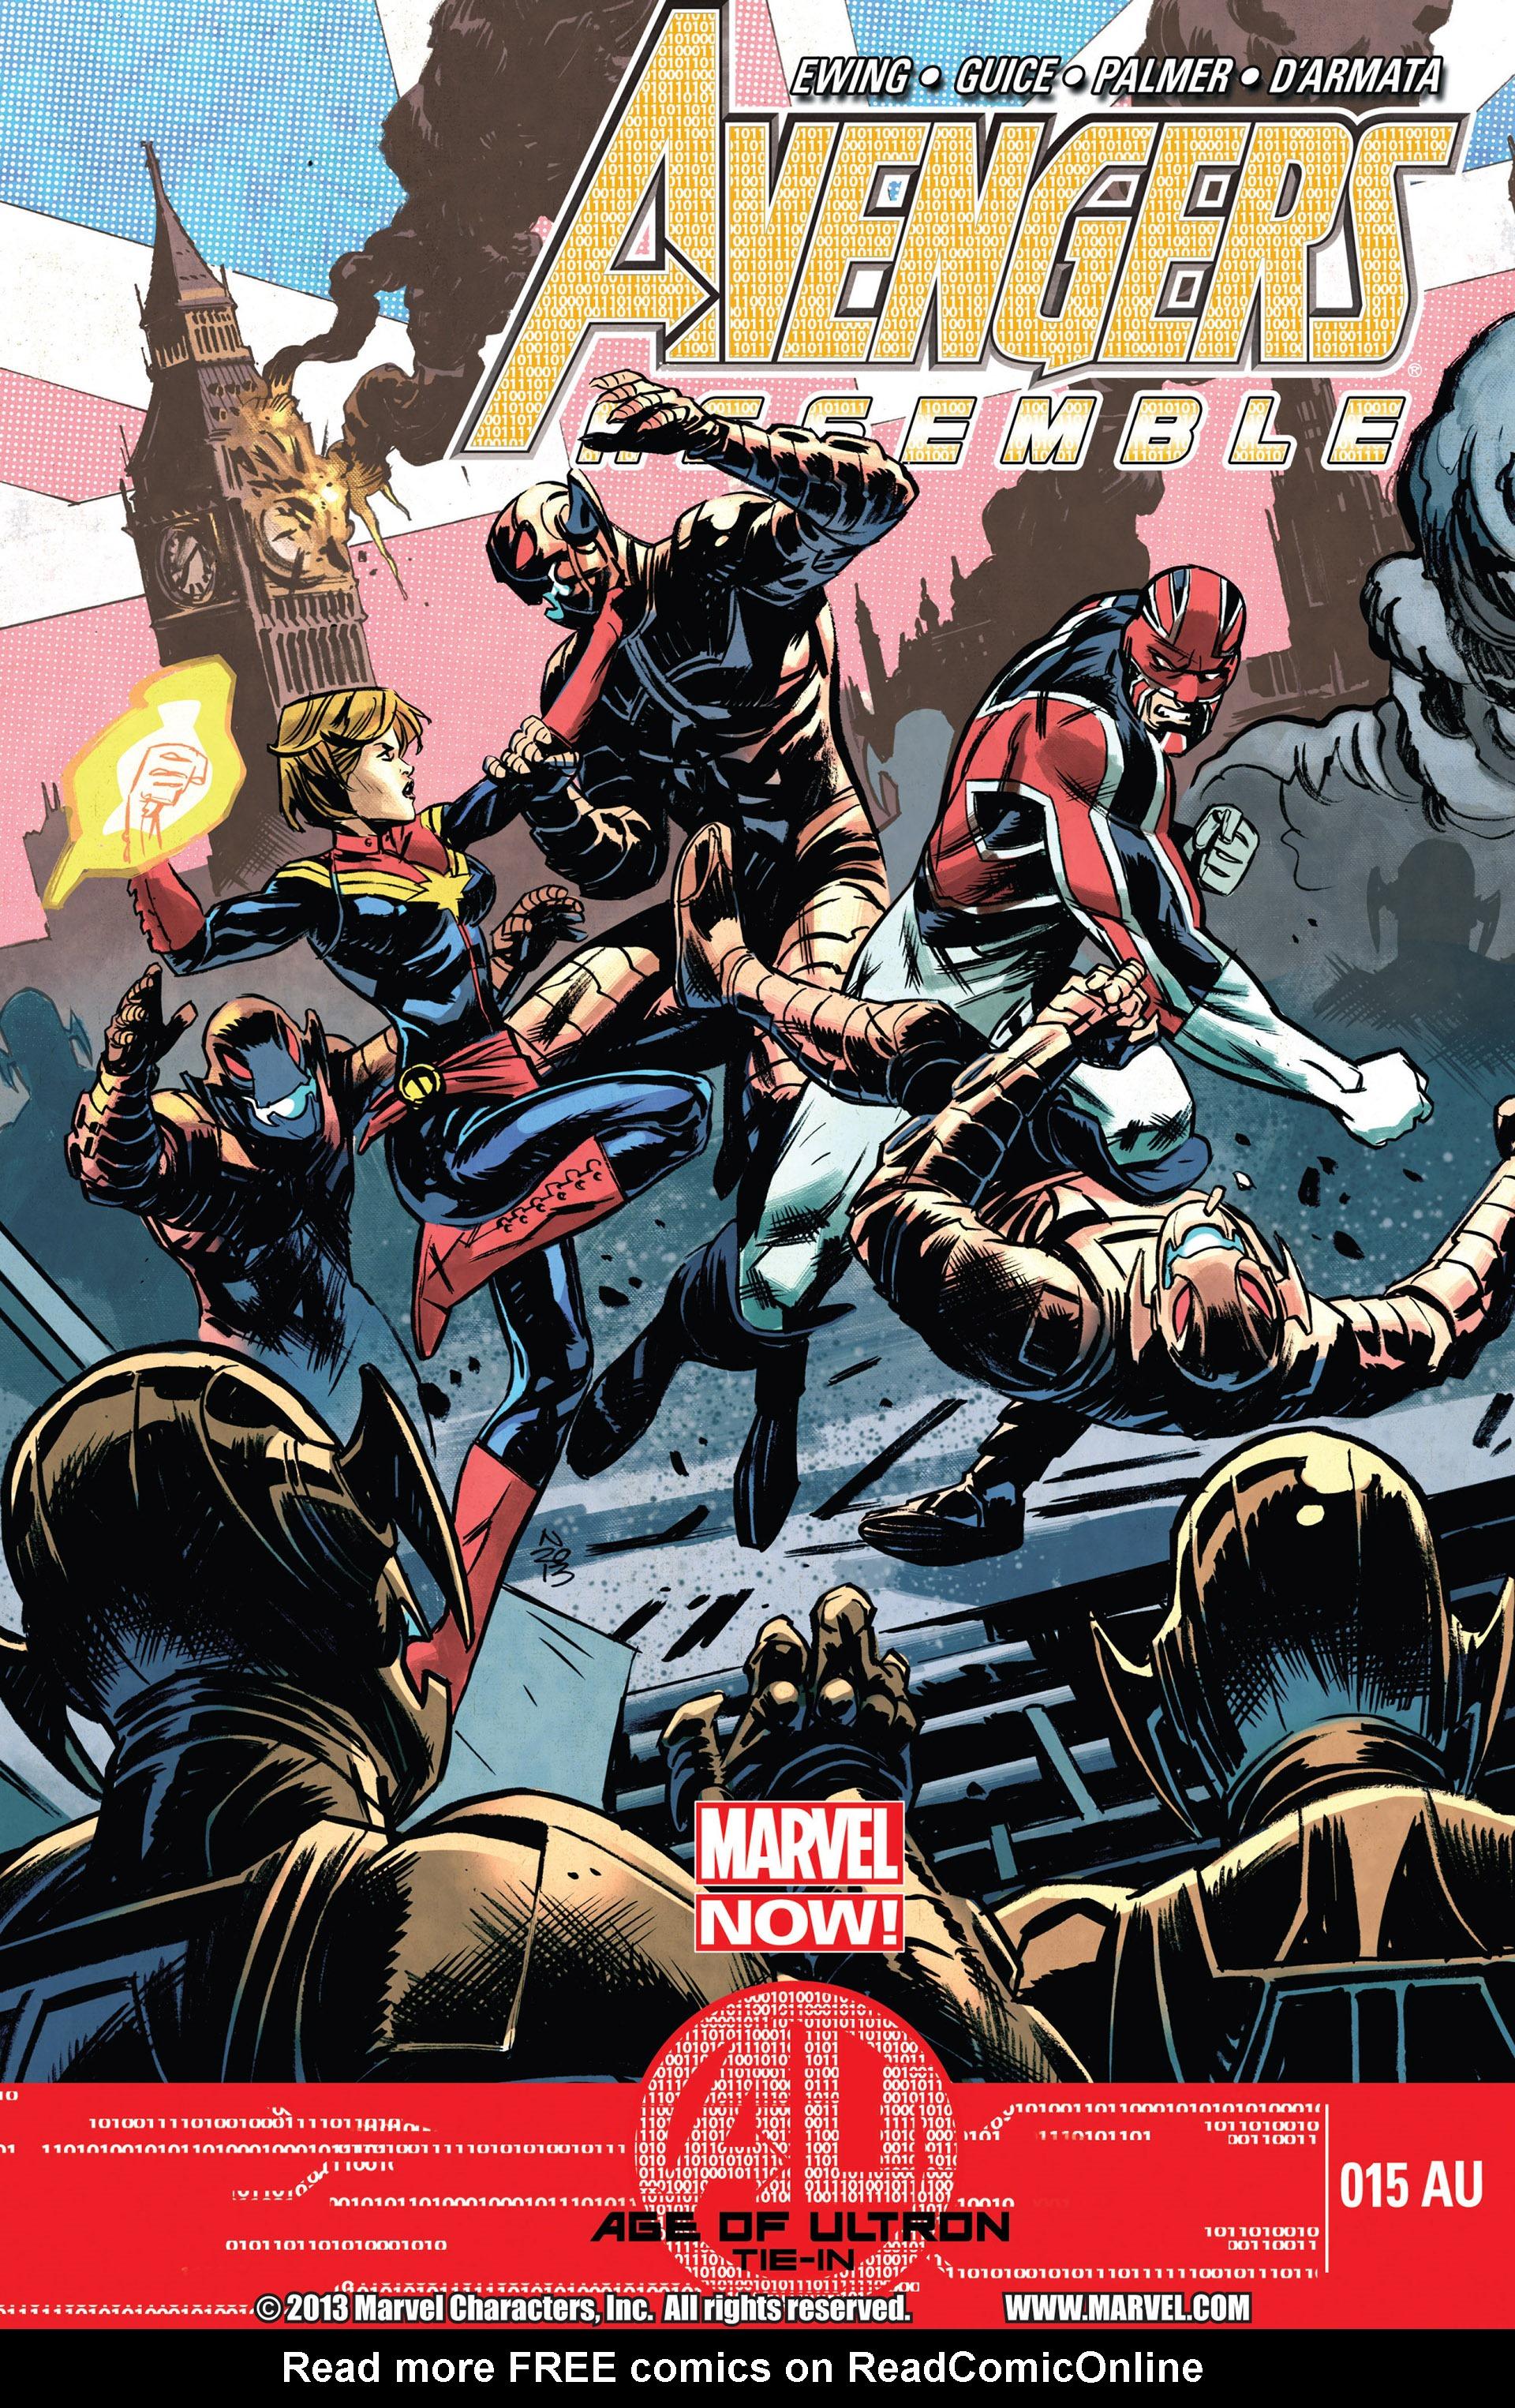 Avengers Assemble (2012) 15 Page 1